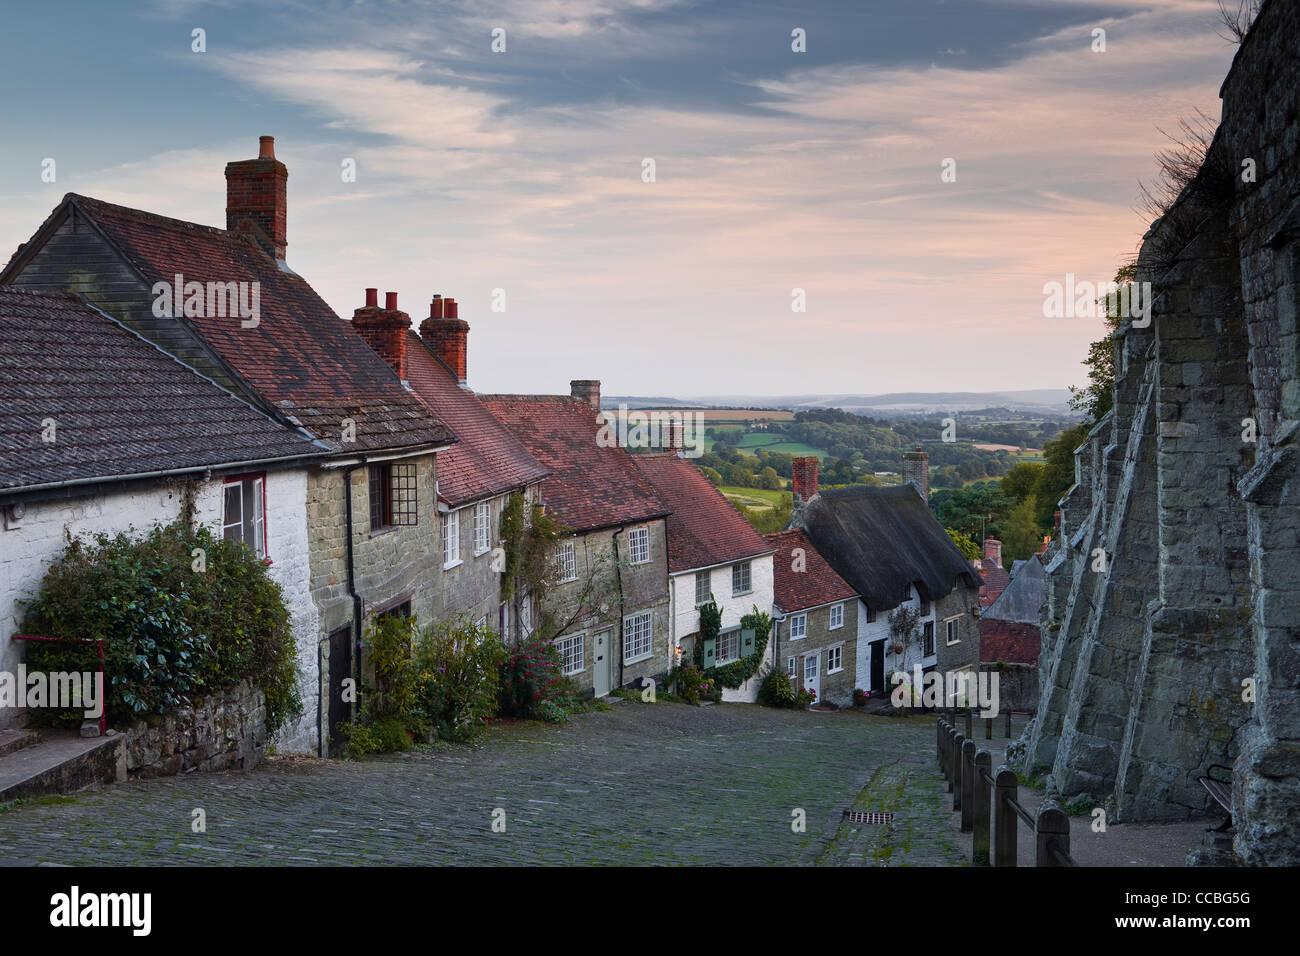 Sunset at Gold Hill, Shaftesbury, Dorset, England, UK. - Stock Image